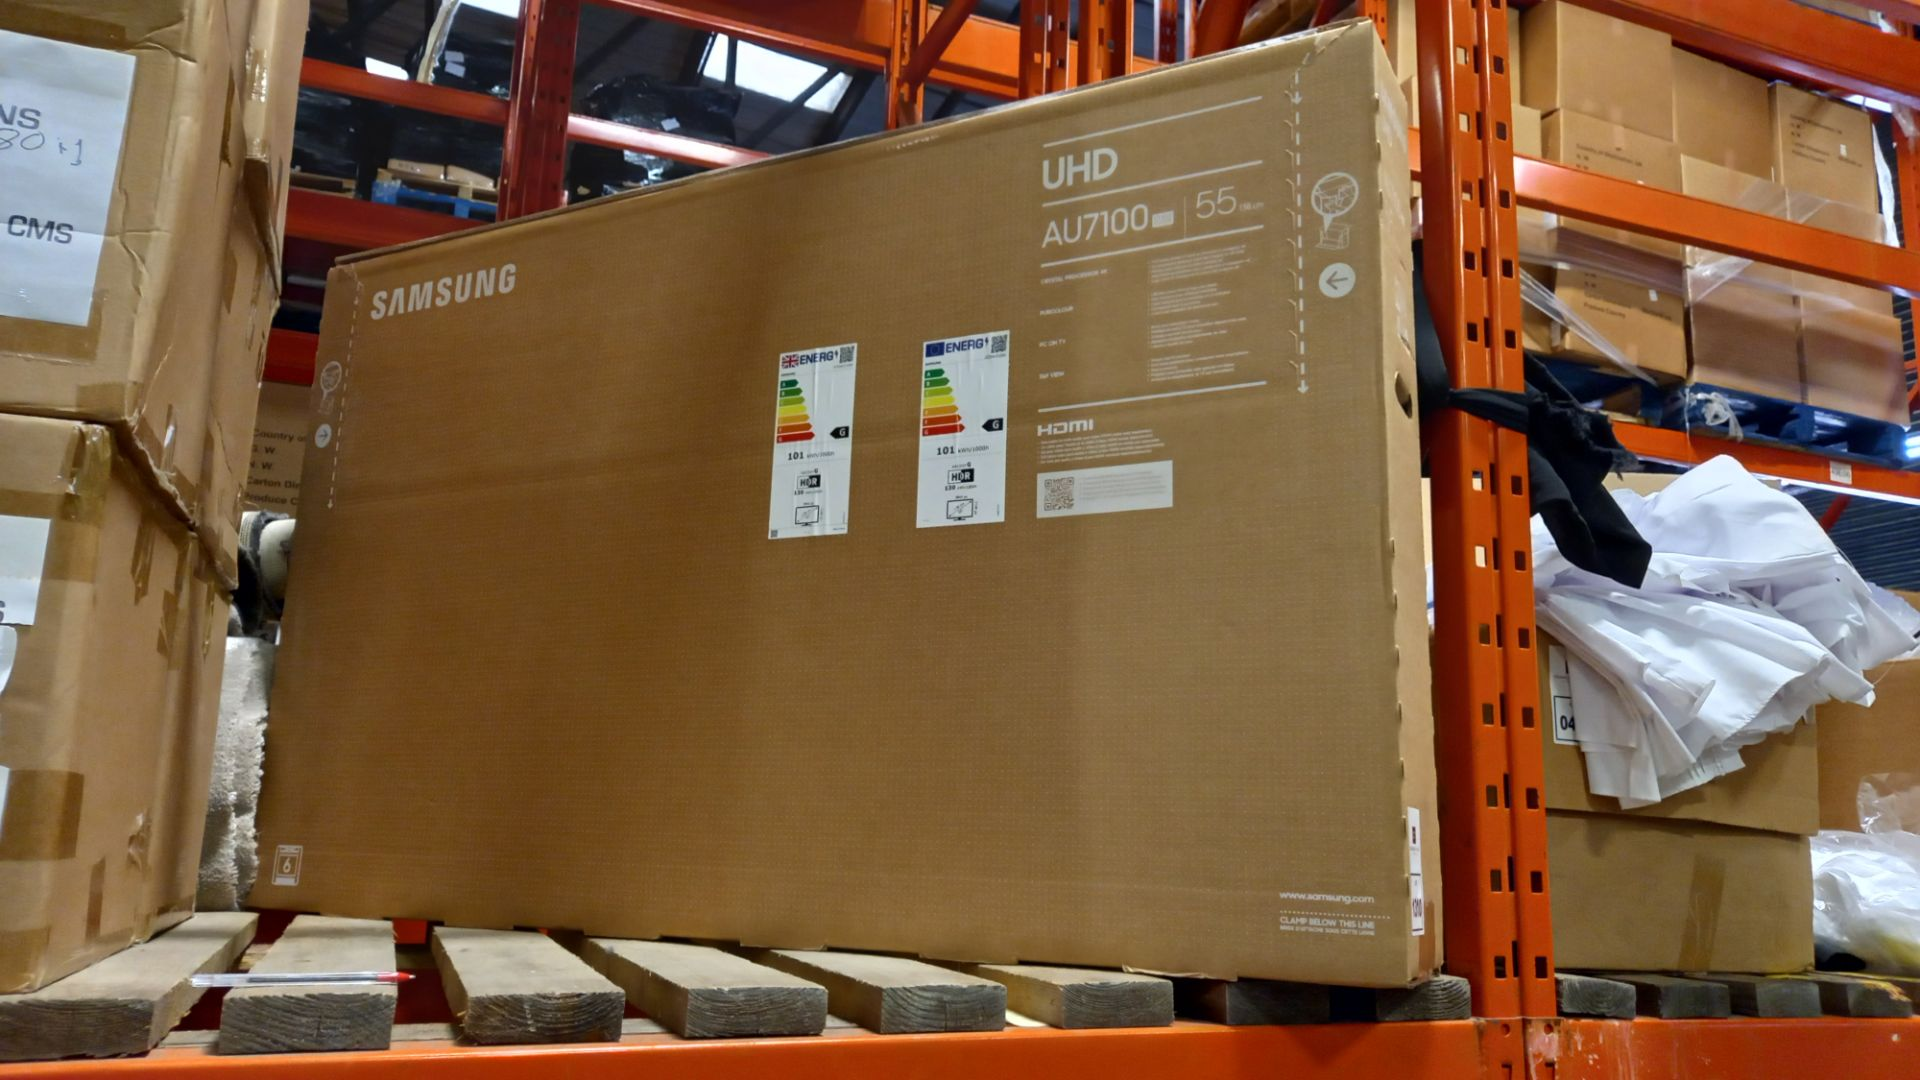 1 X BRAND NEW SAMSUNG UHD 55 TV (AU7100)